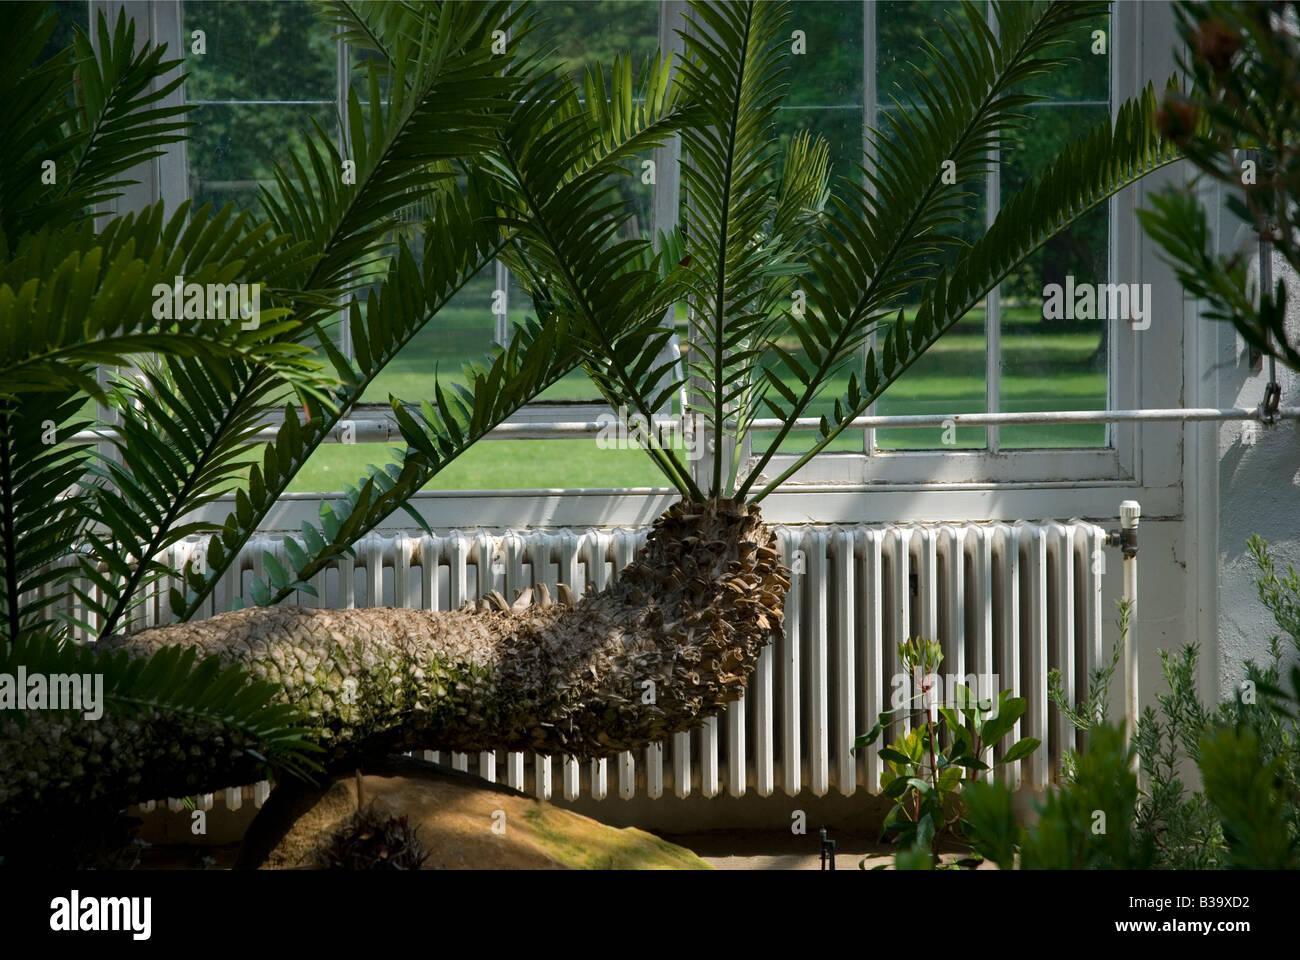 london temperate house in kew gardens